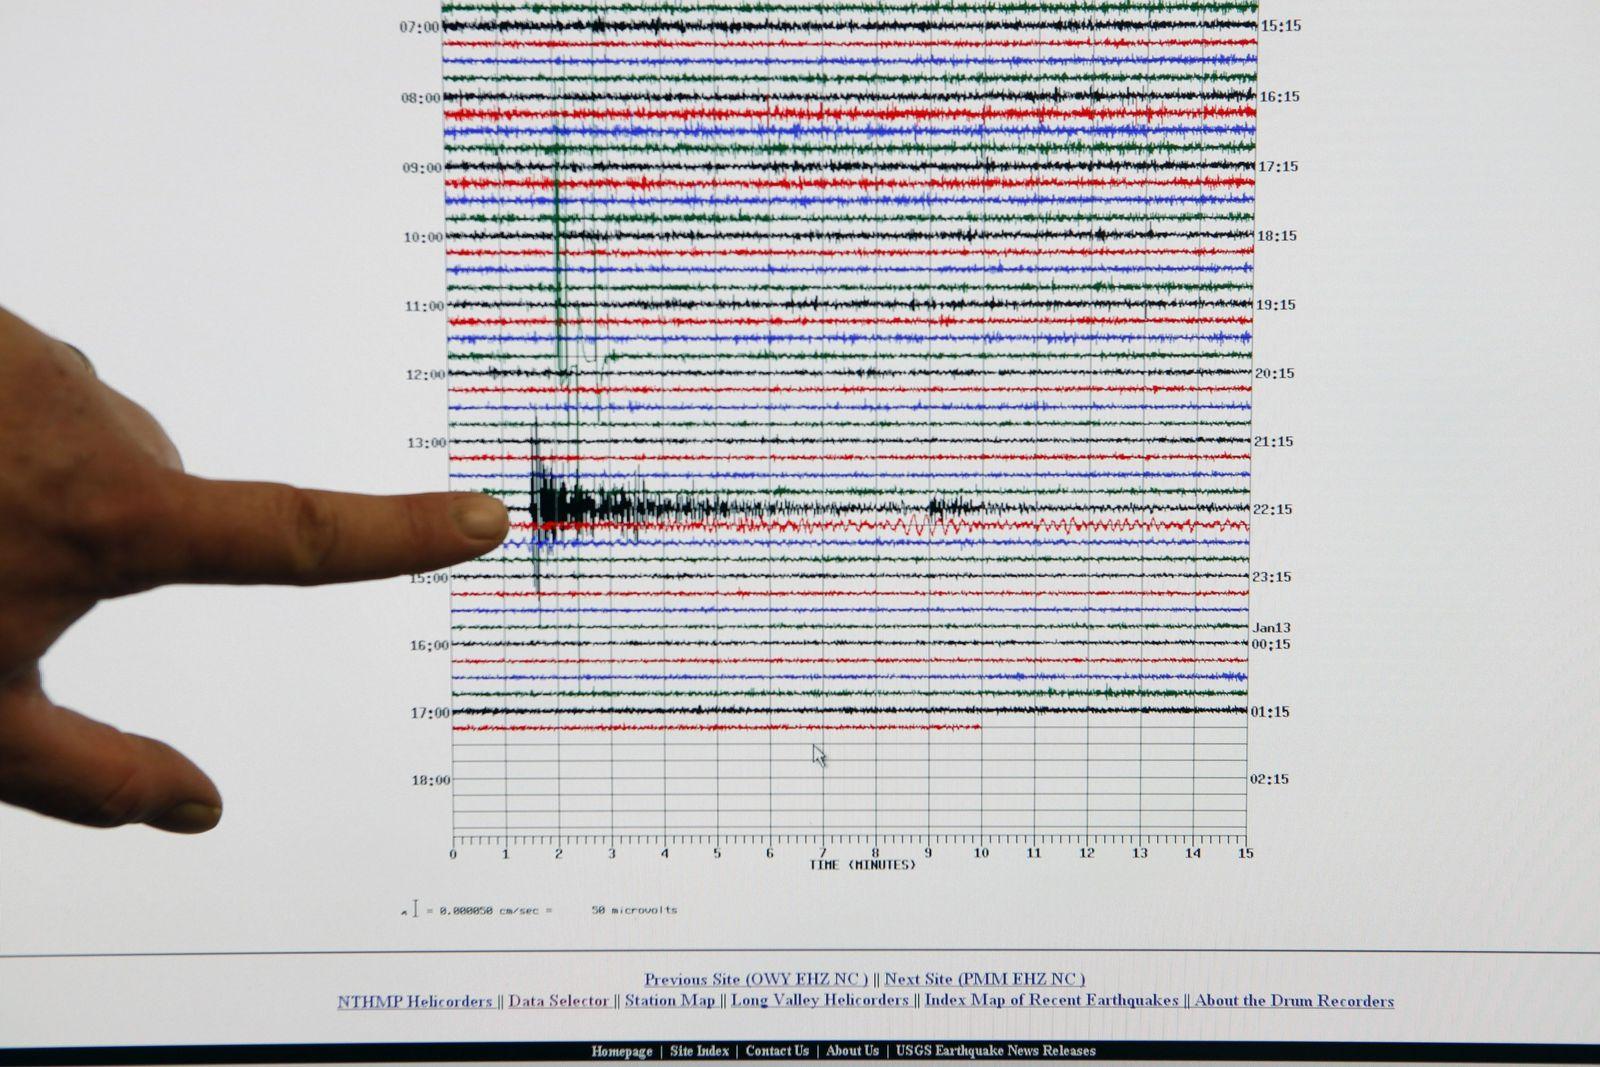 Haiti / Erdbeben / Seismogramm